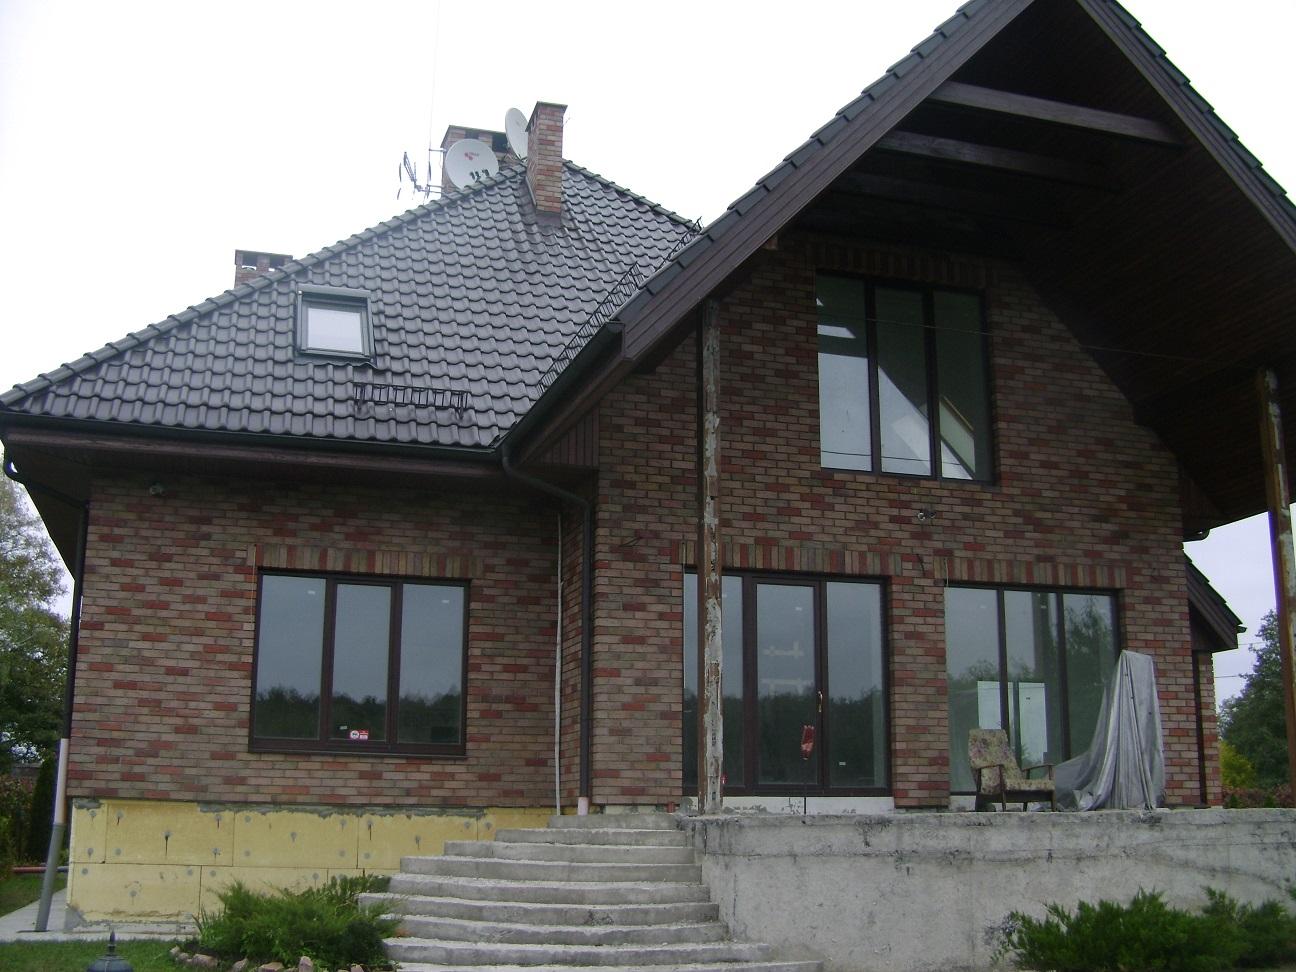 Продаж будинку з озером в с. Зазим`я. Мальовниче місце!